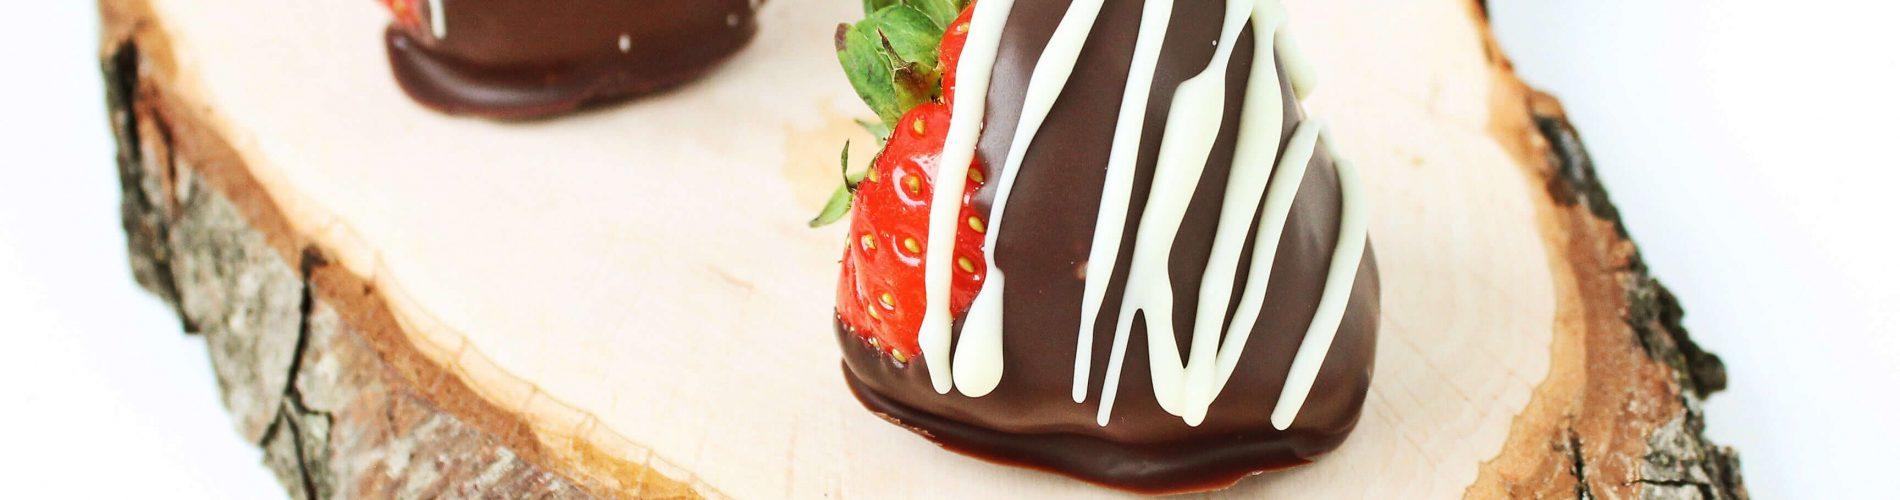 Aardbeien met chocolade